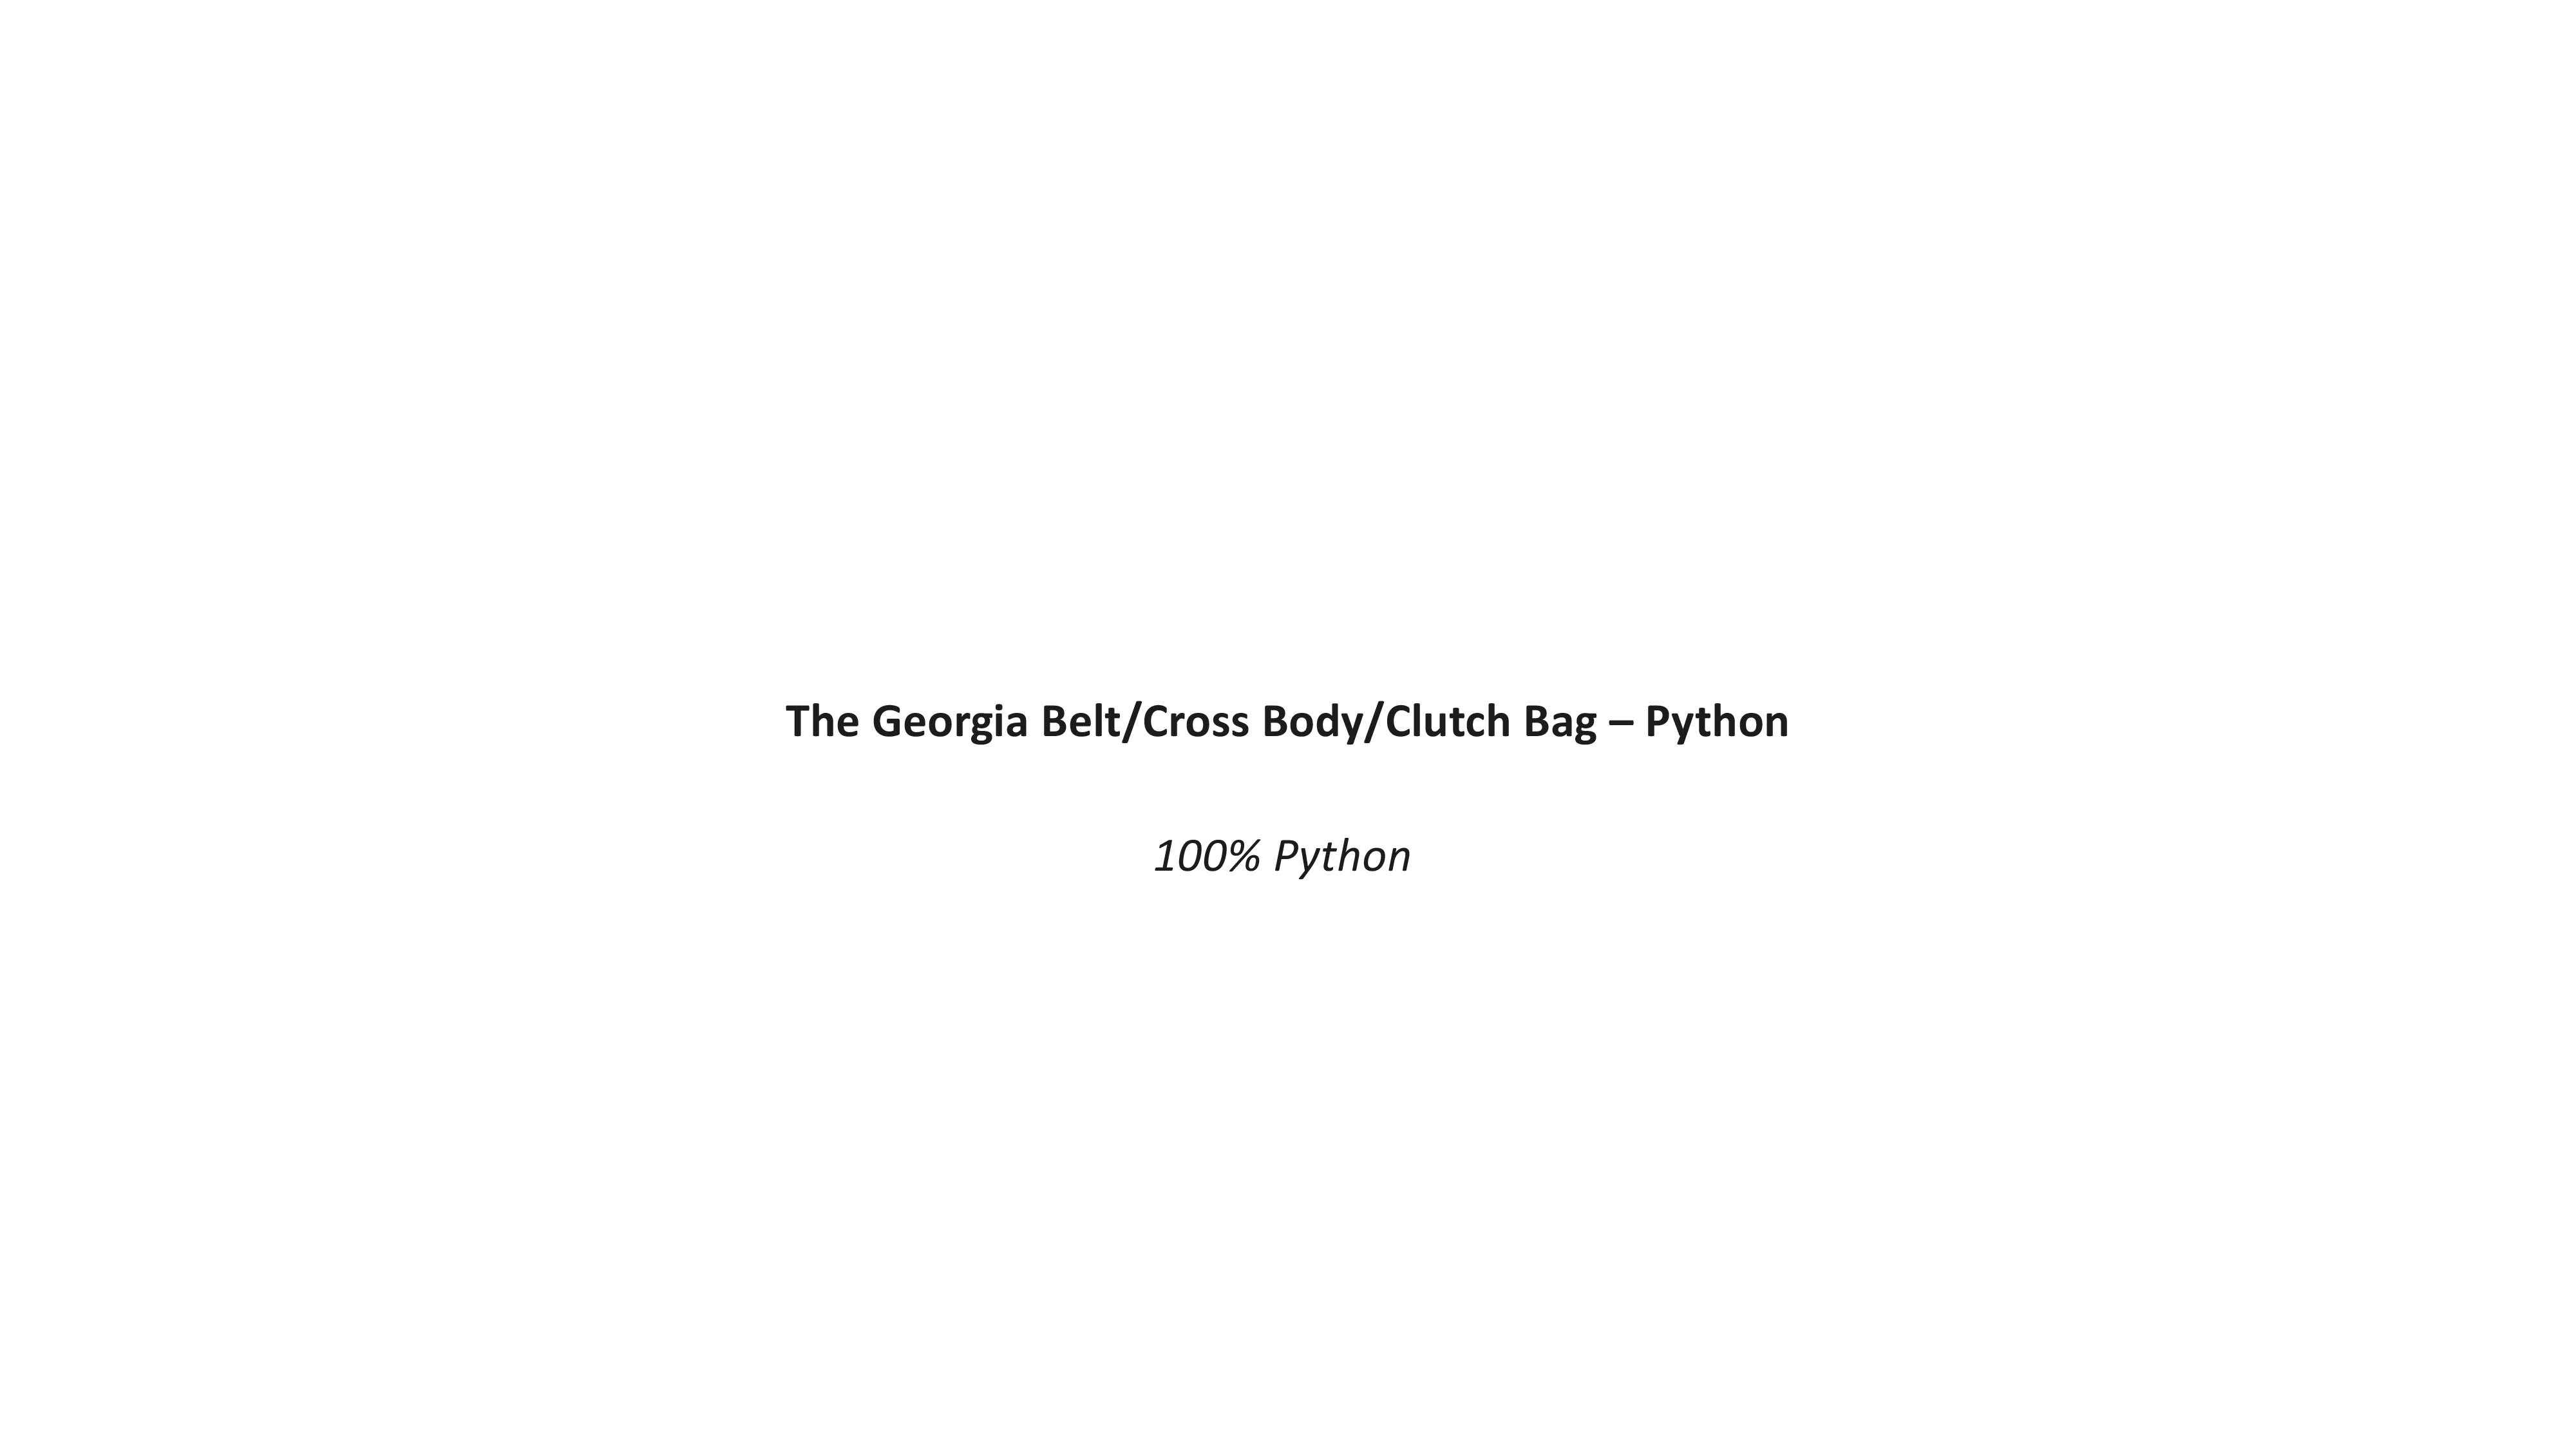 BRUSH PYTHON LOOK BOOK-3